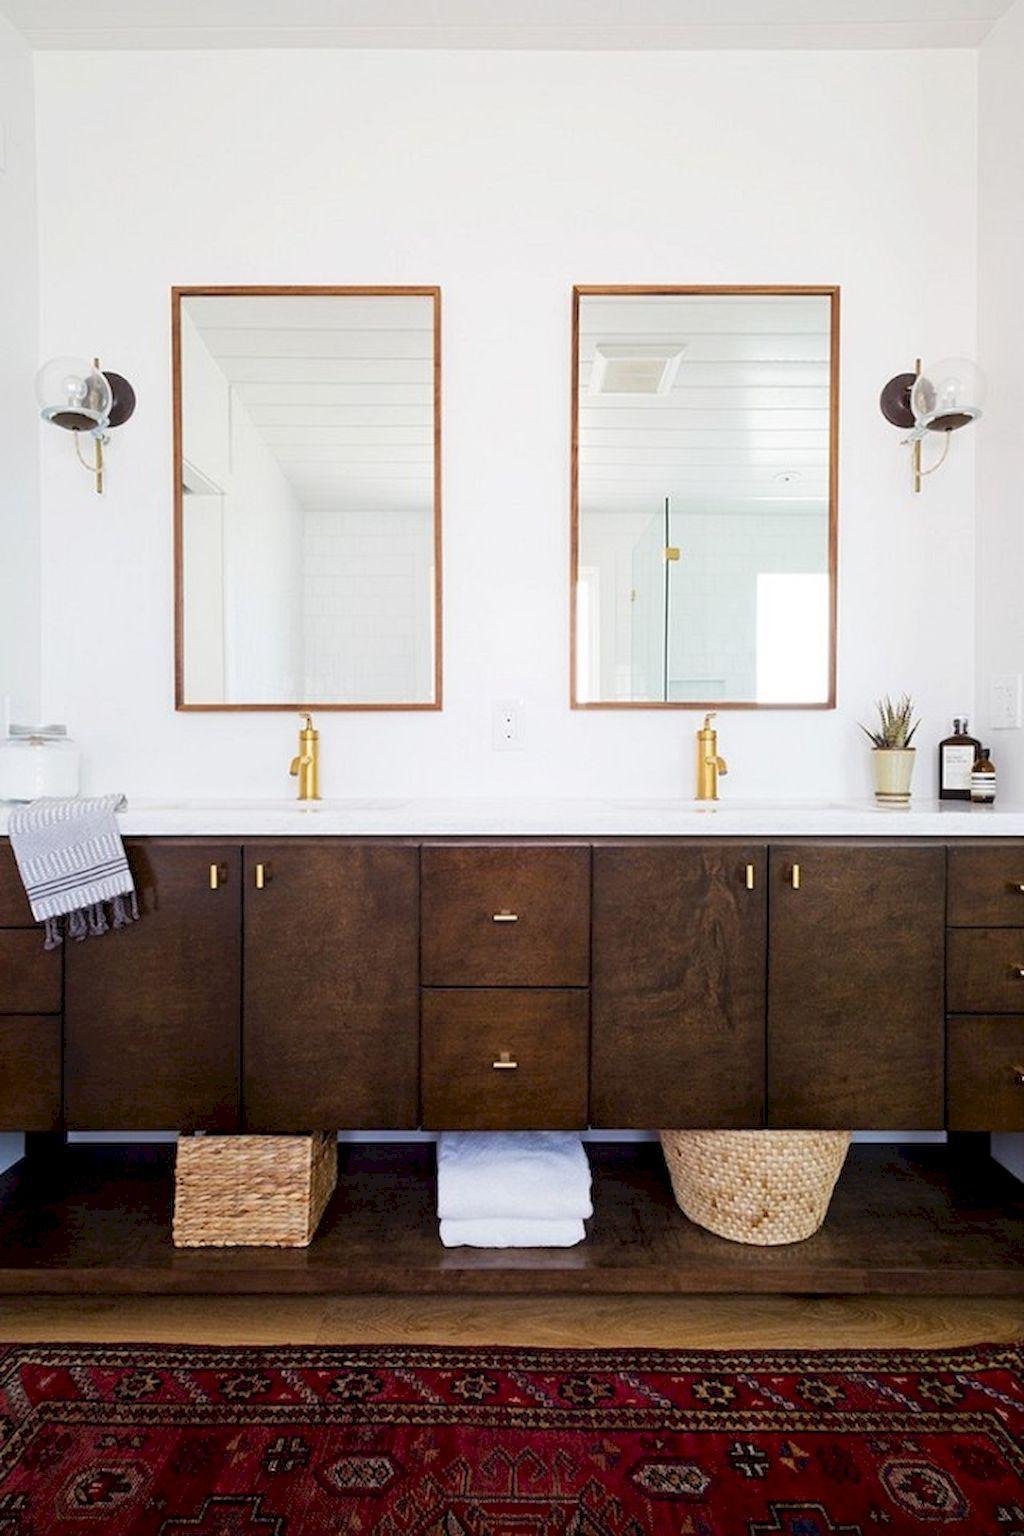 50 Smart and Easy Tips Bathroom Organization Ideas | Bathroom ...